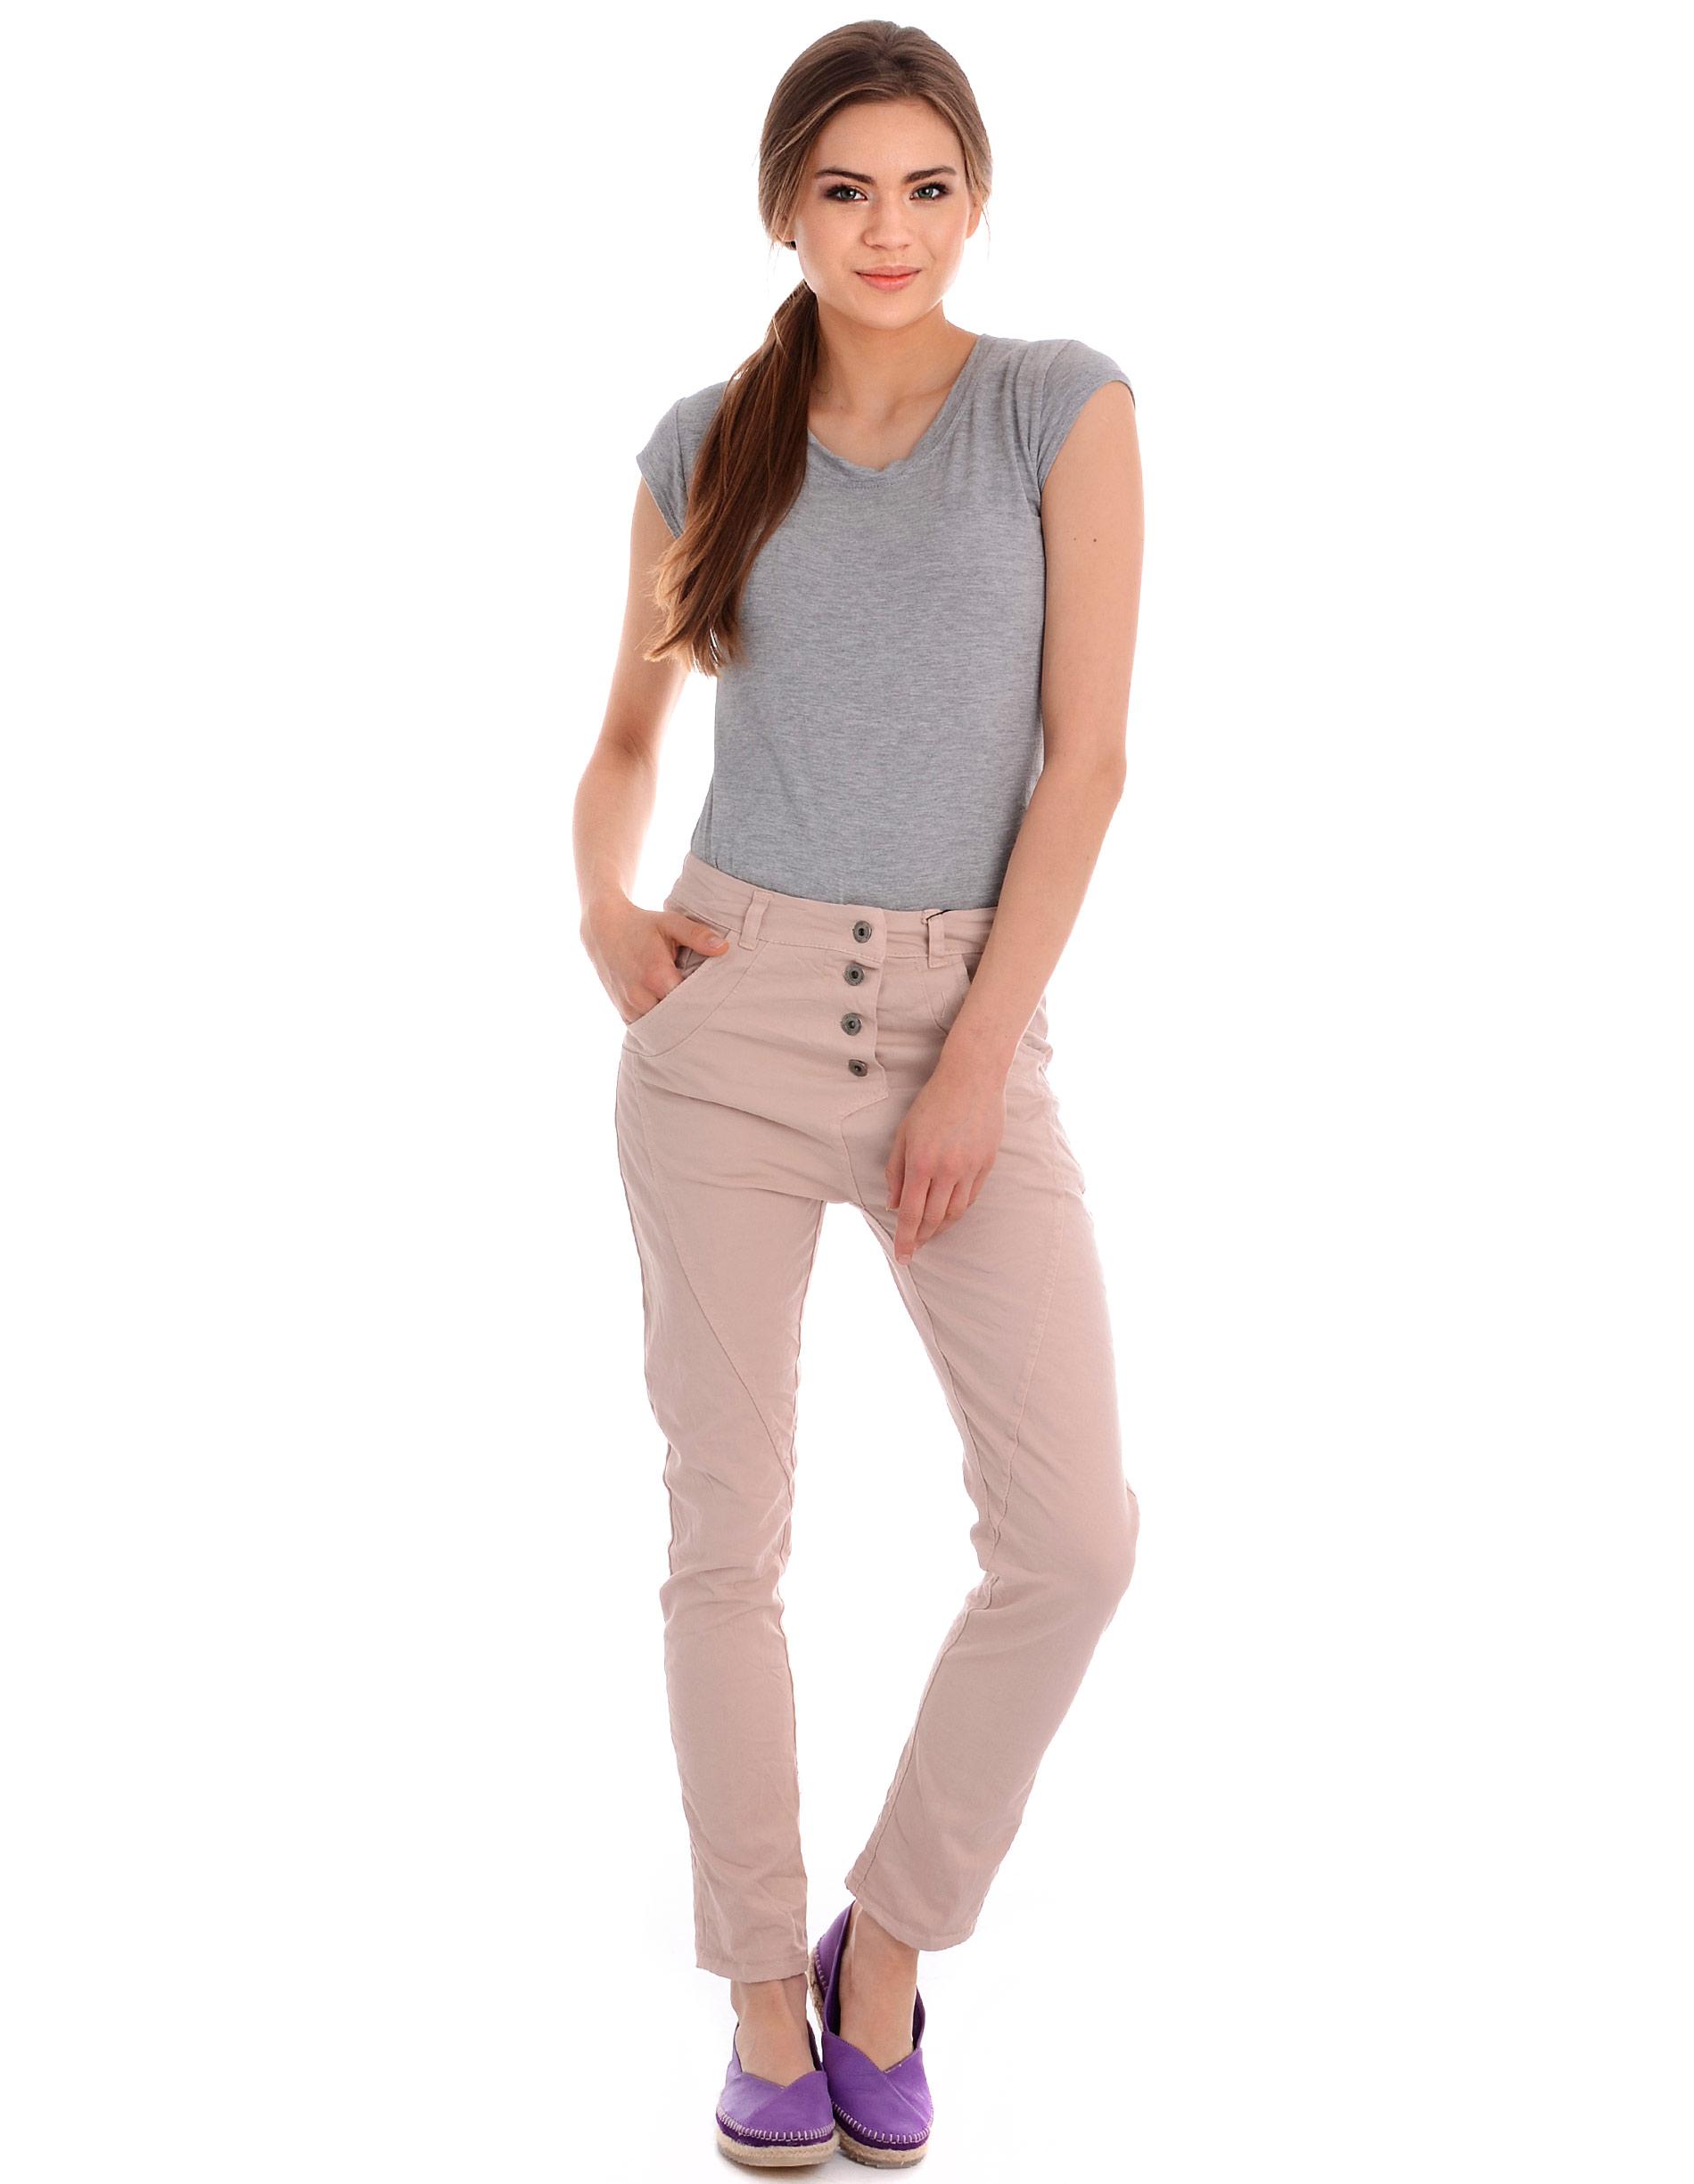 Spodnie - 104-1203 CIPR - Unisono